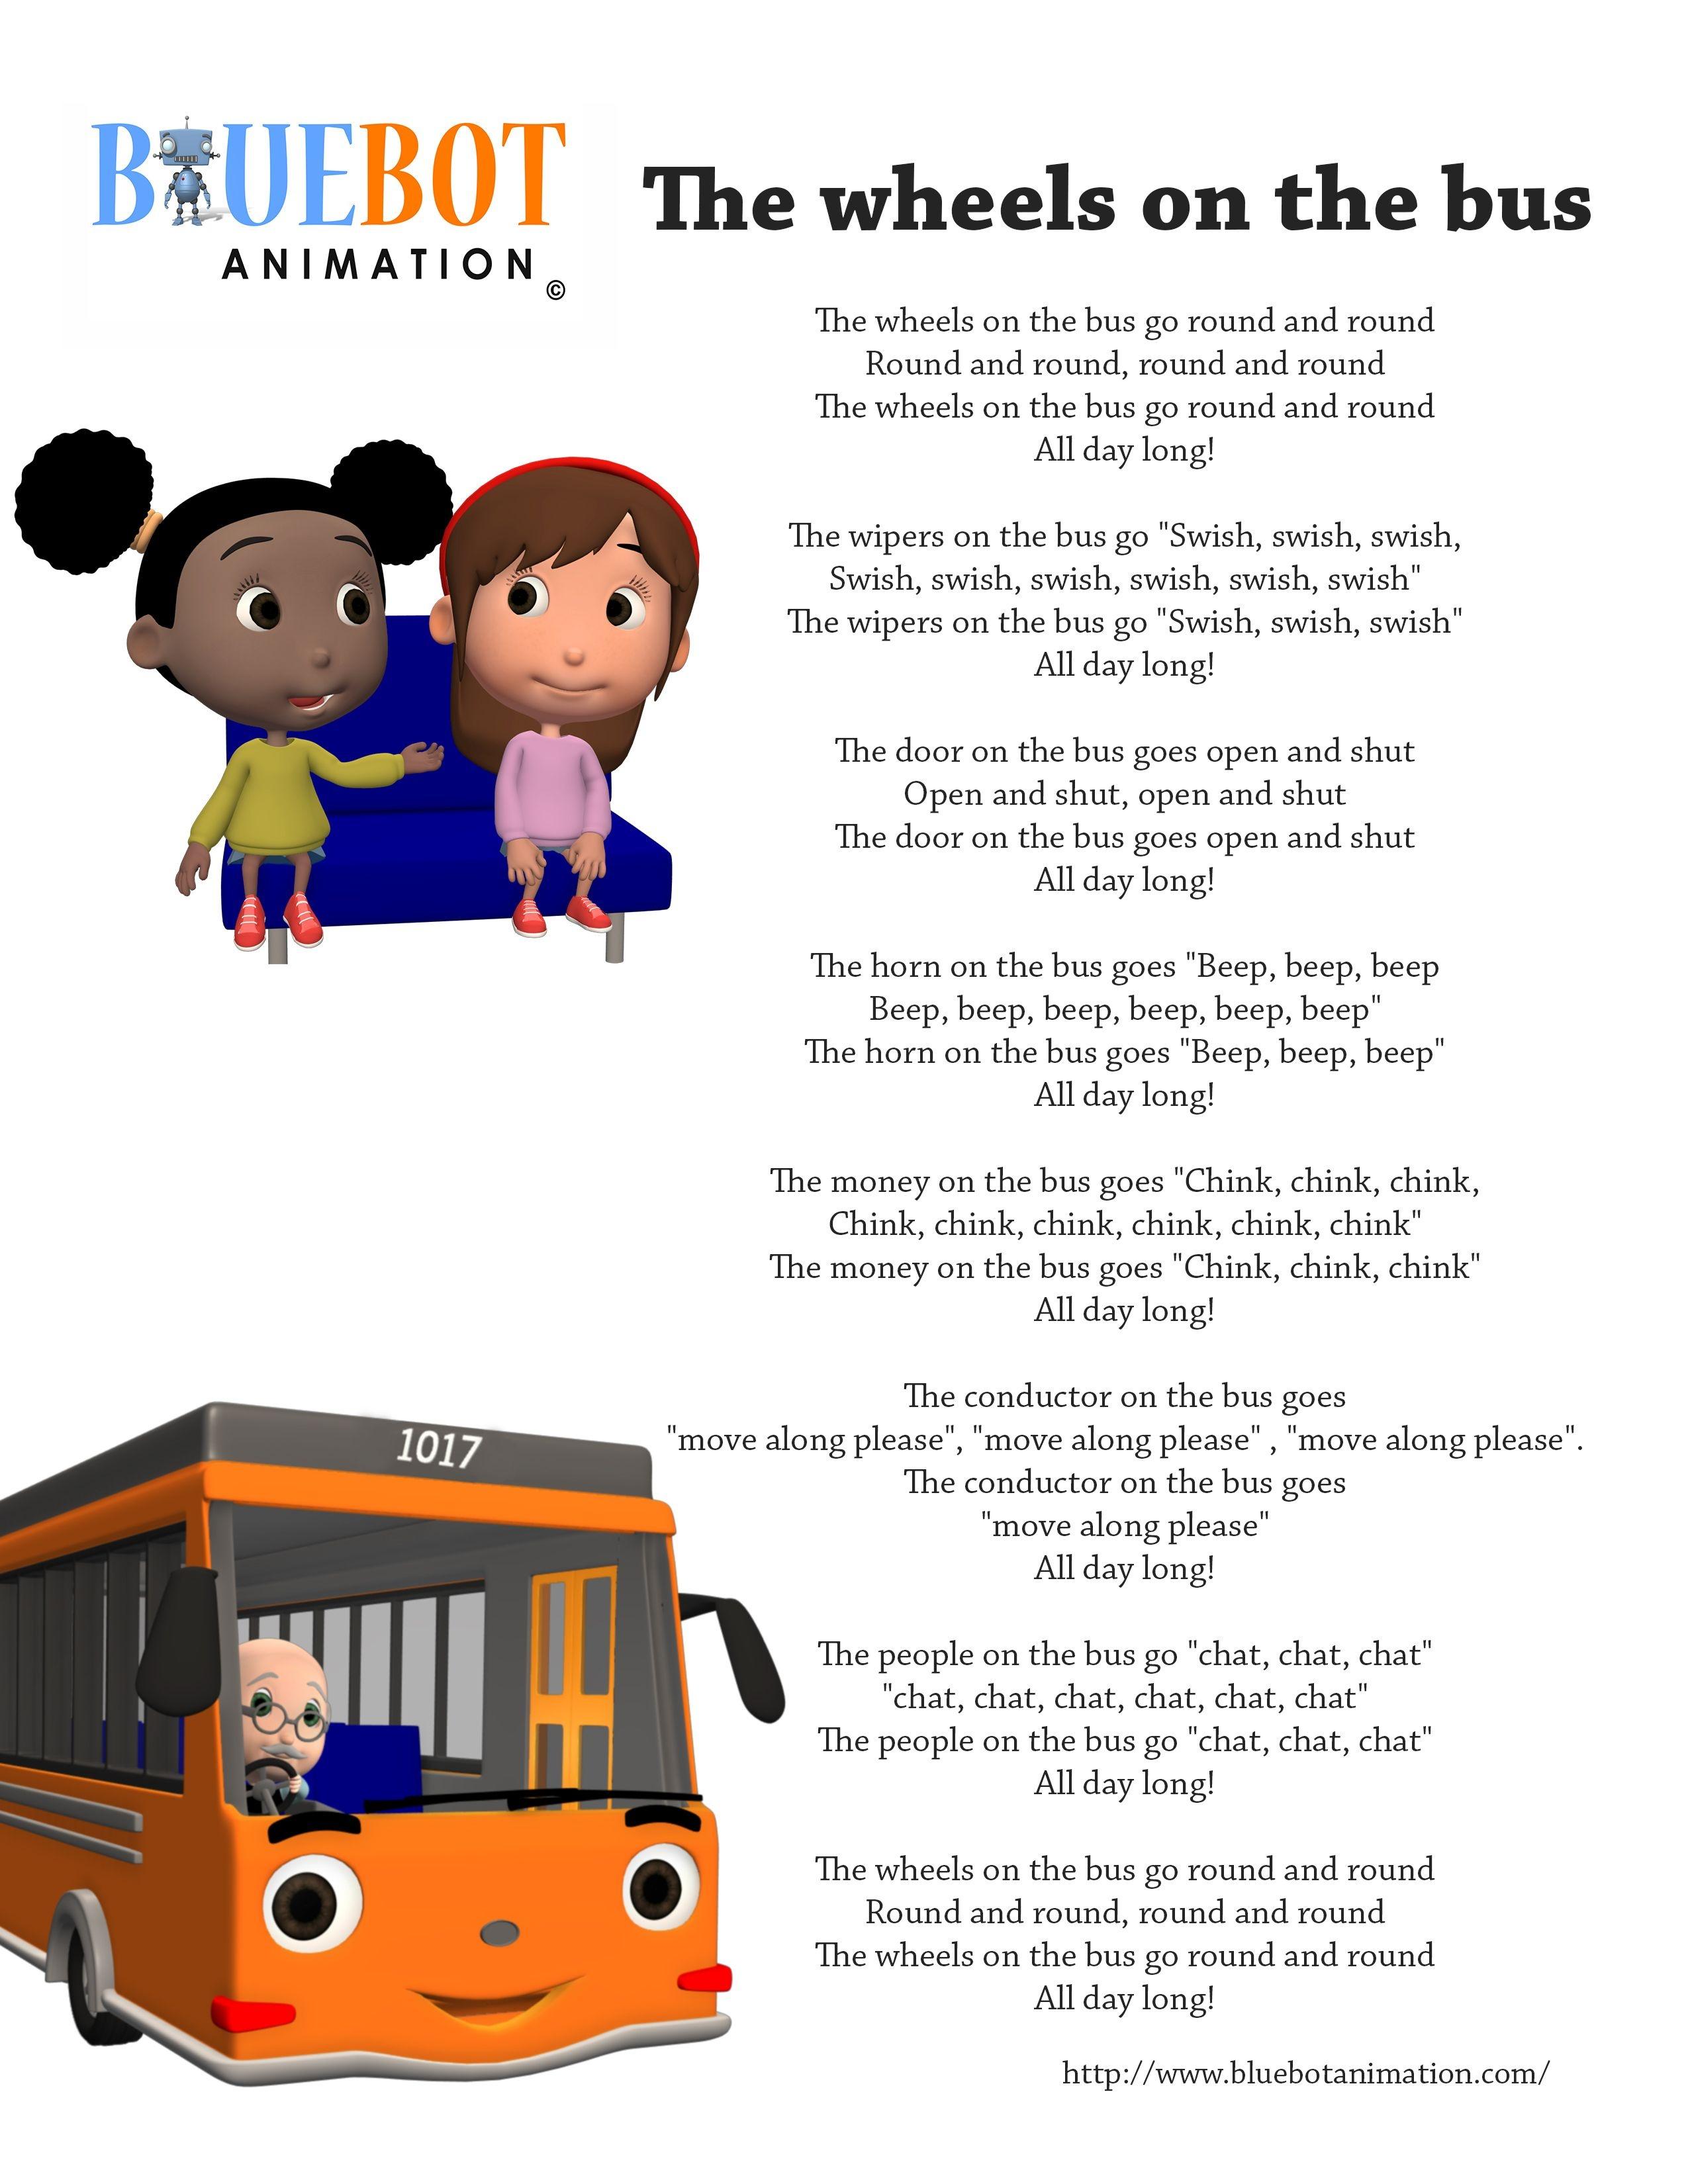 Wheels On The Bus Nursery Rhyme Lyrics Free Printable Nursery Rhyme - Free Printable Nursery Rhymes Songs